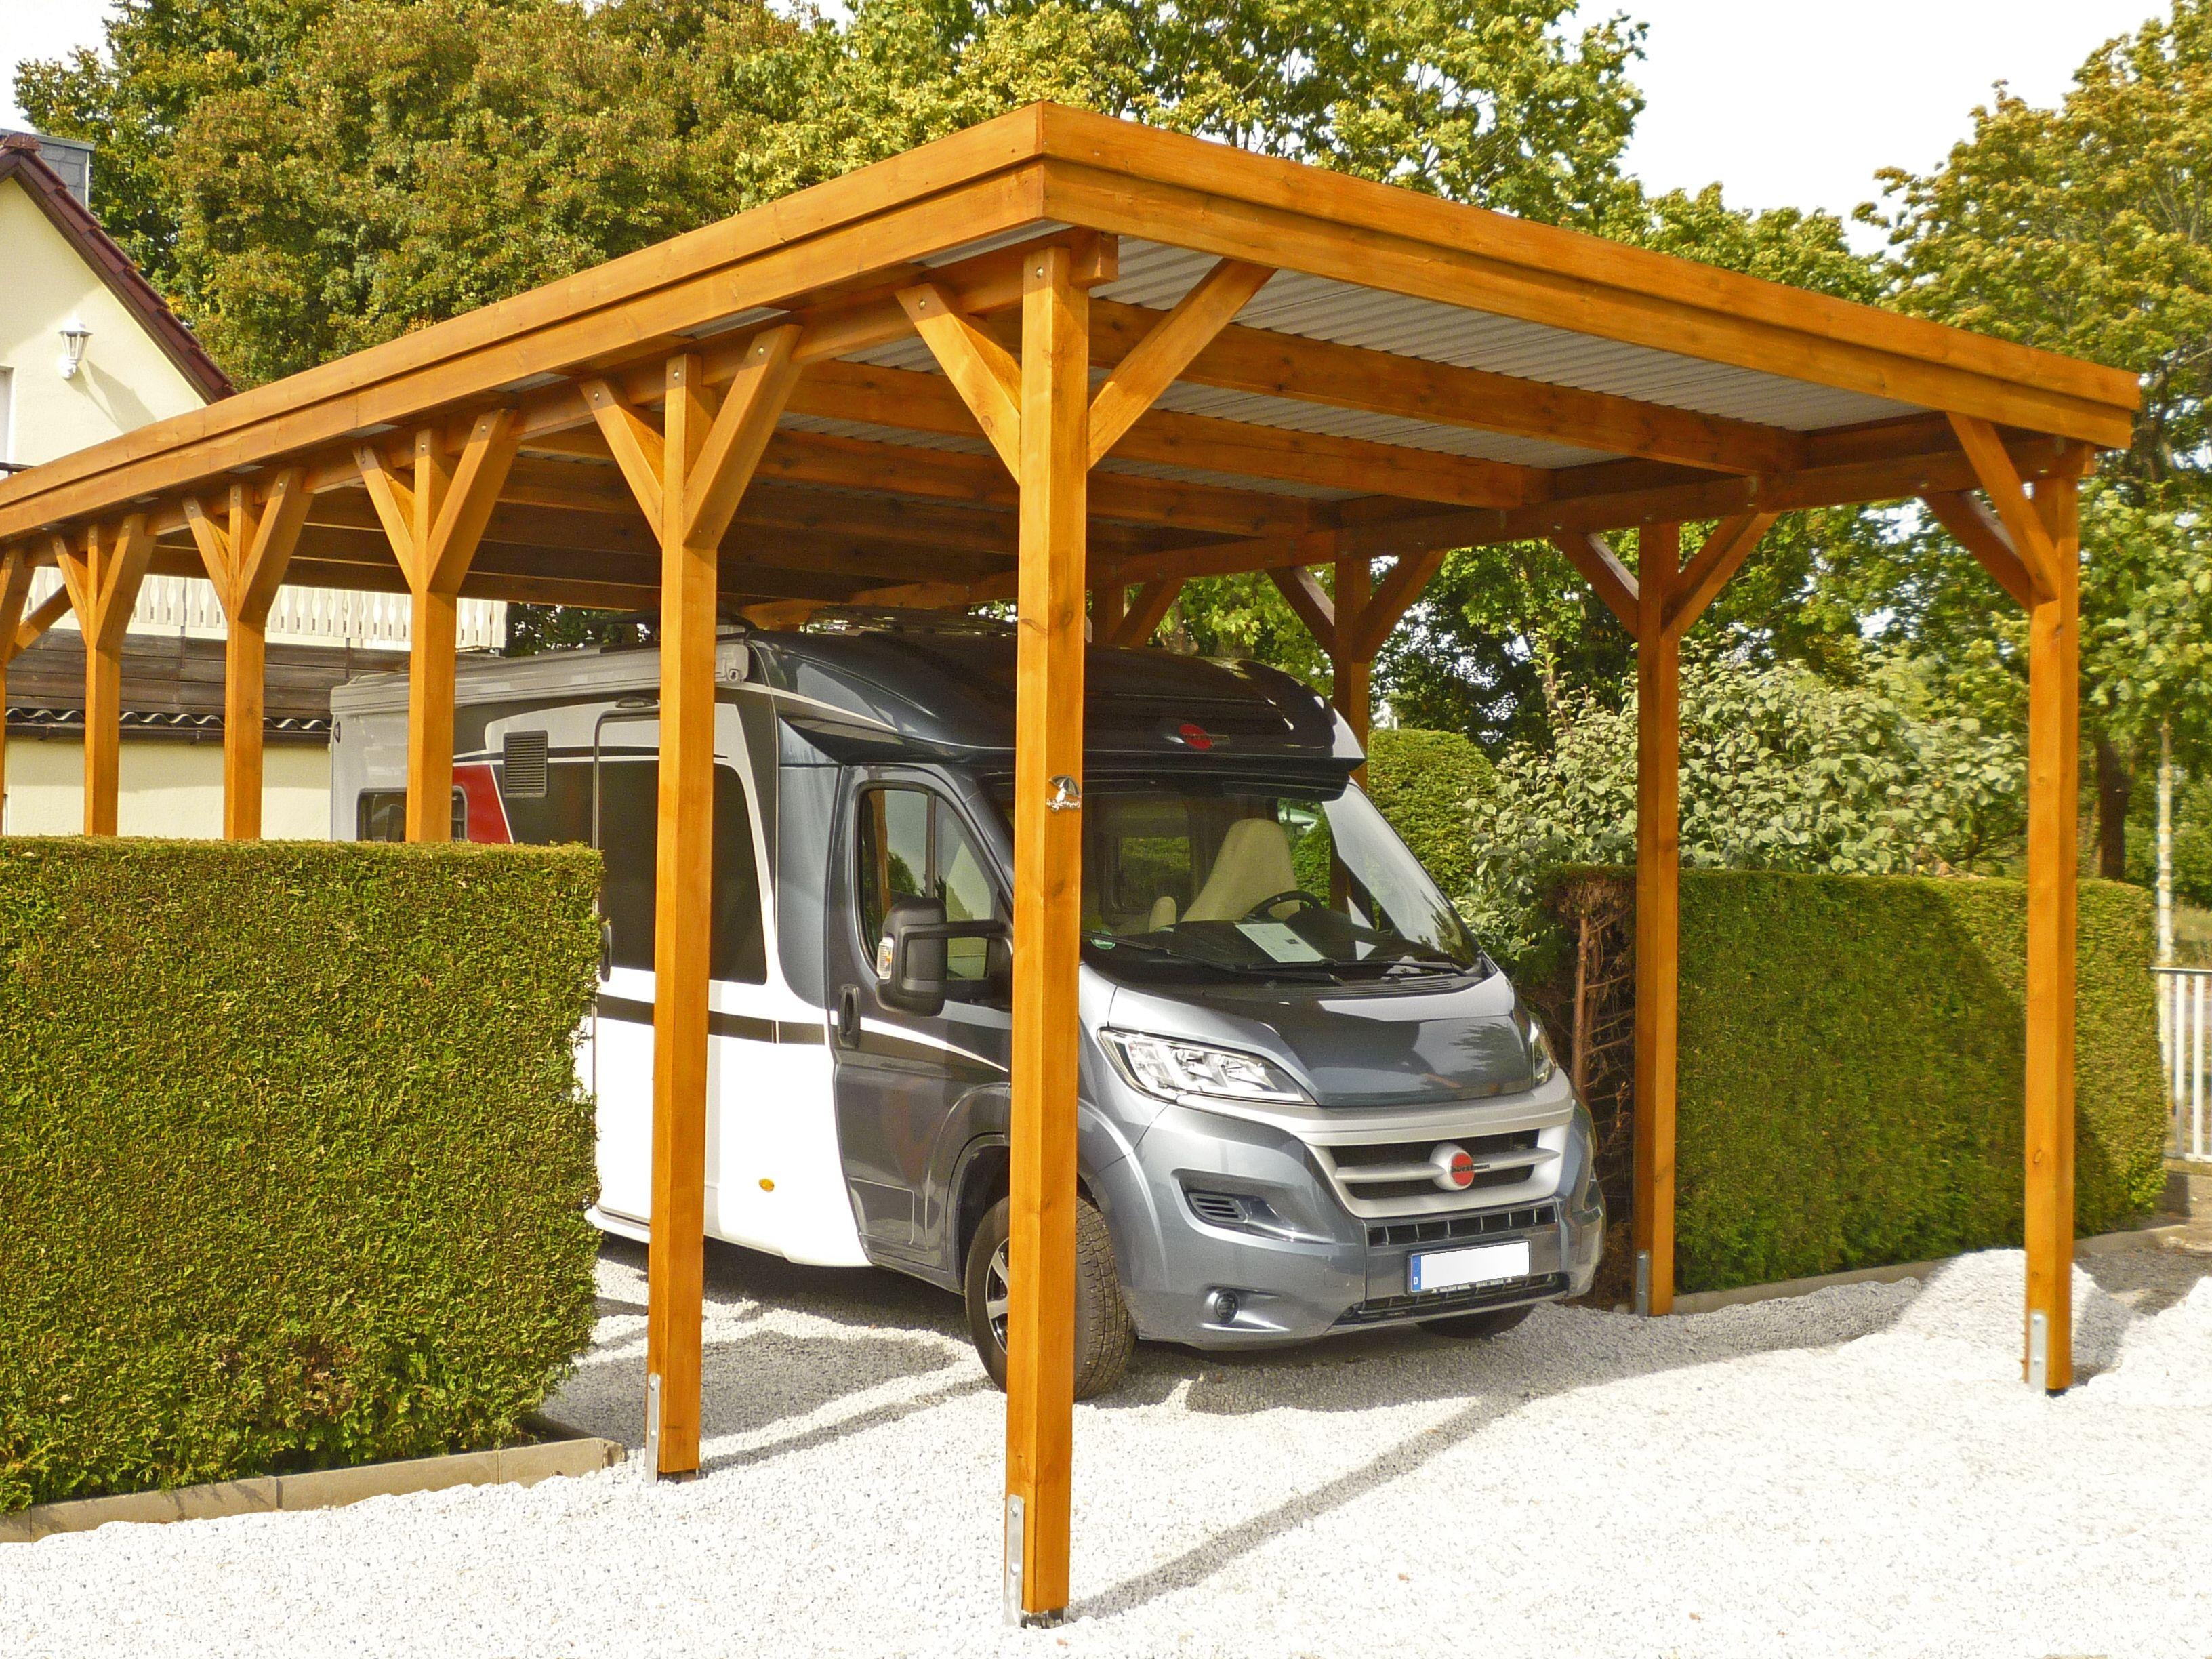 Wohnmobil Carport Carport Carport Wohnmobil Carports